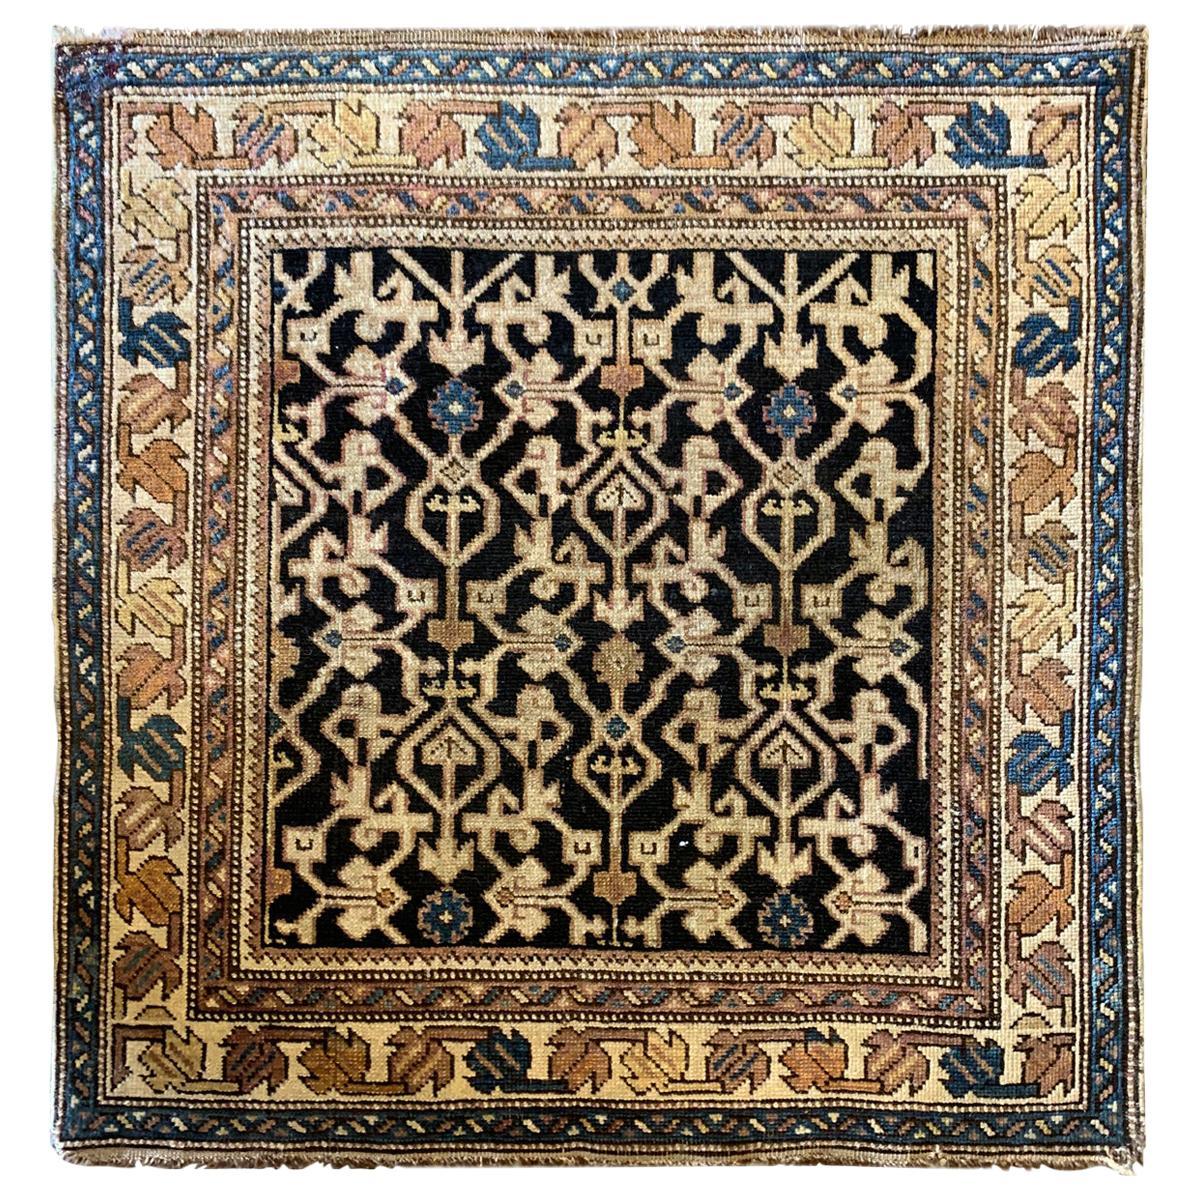 Antique Rugs Oriental Caucasian Kuba, Traditional Handmade Carpet